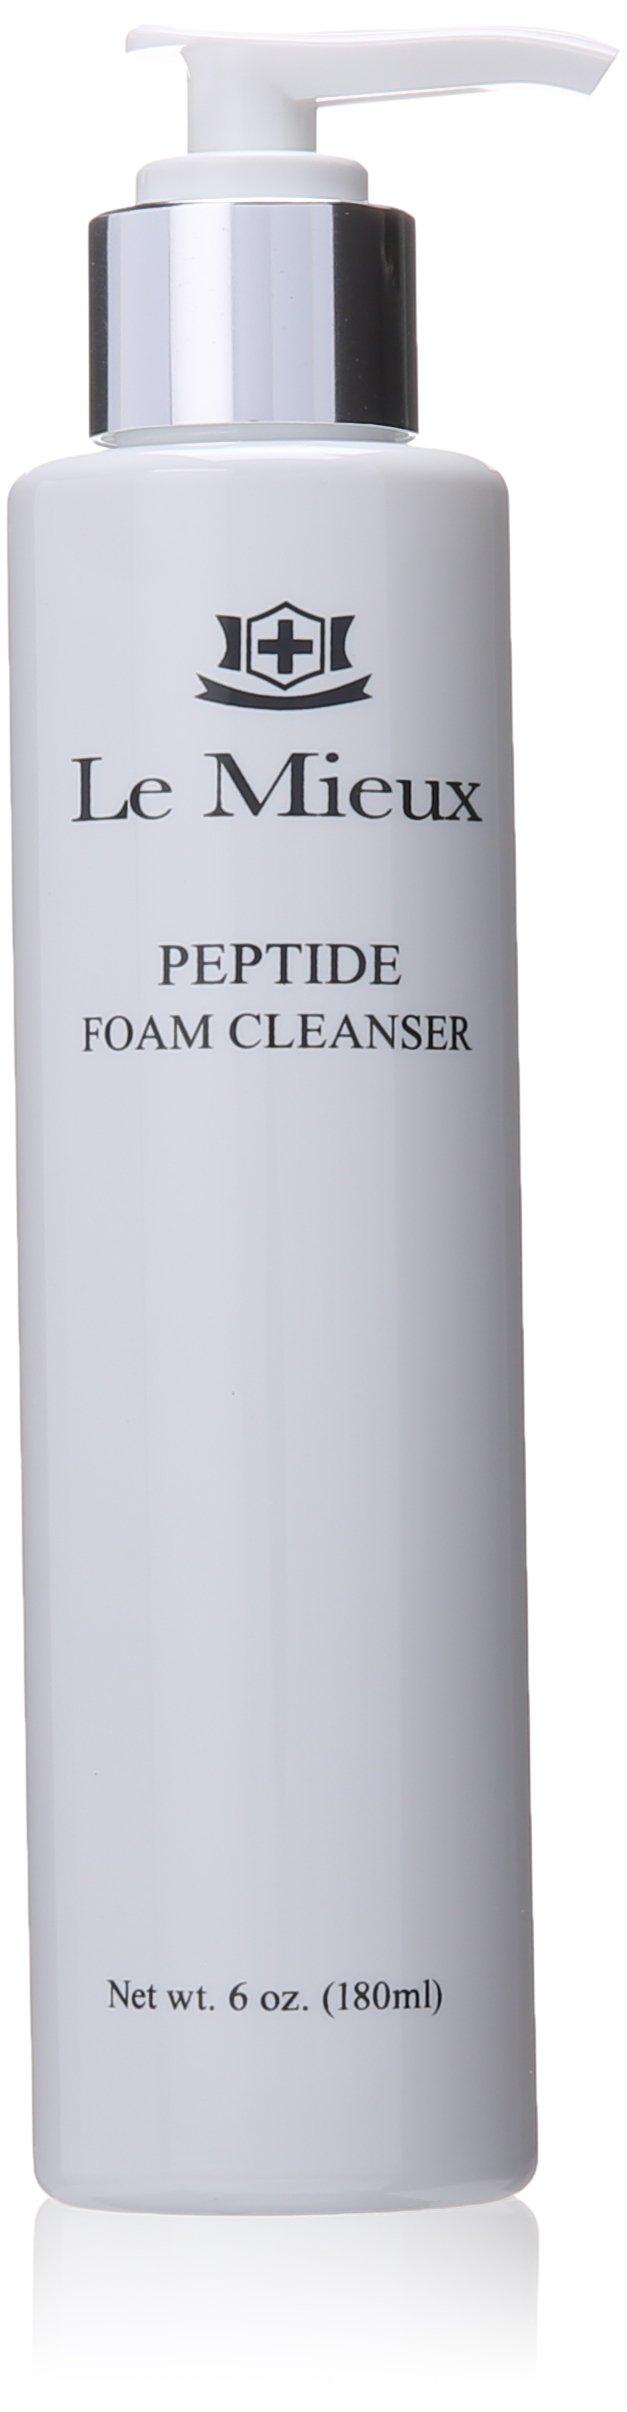 Le Mieux Peptide Foam Cleanser, 6 Ounce